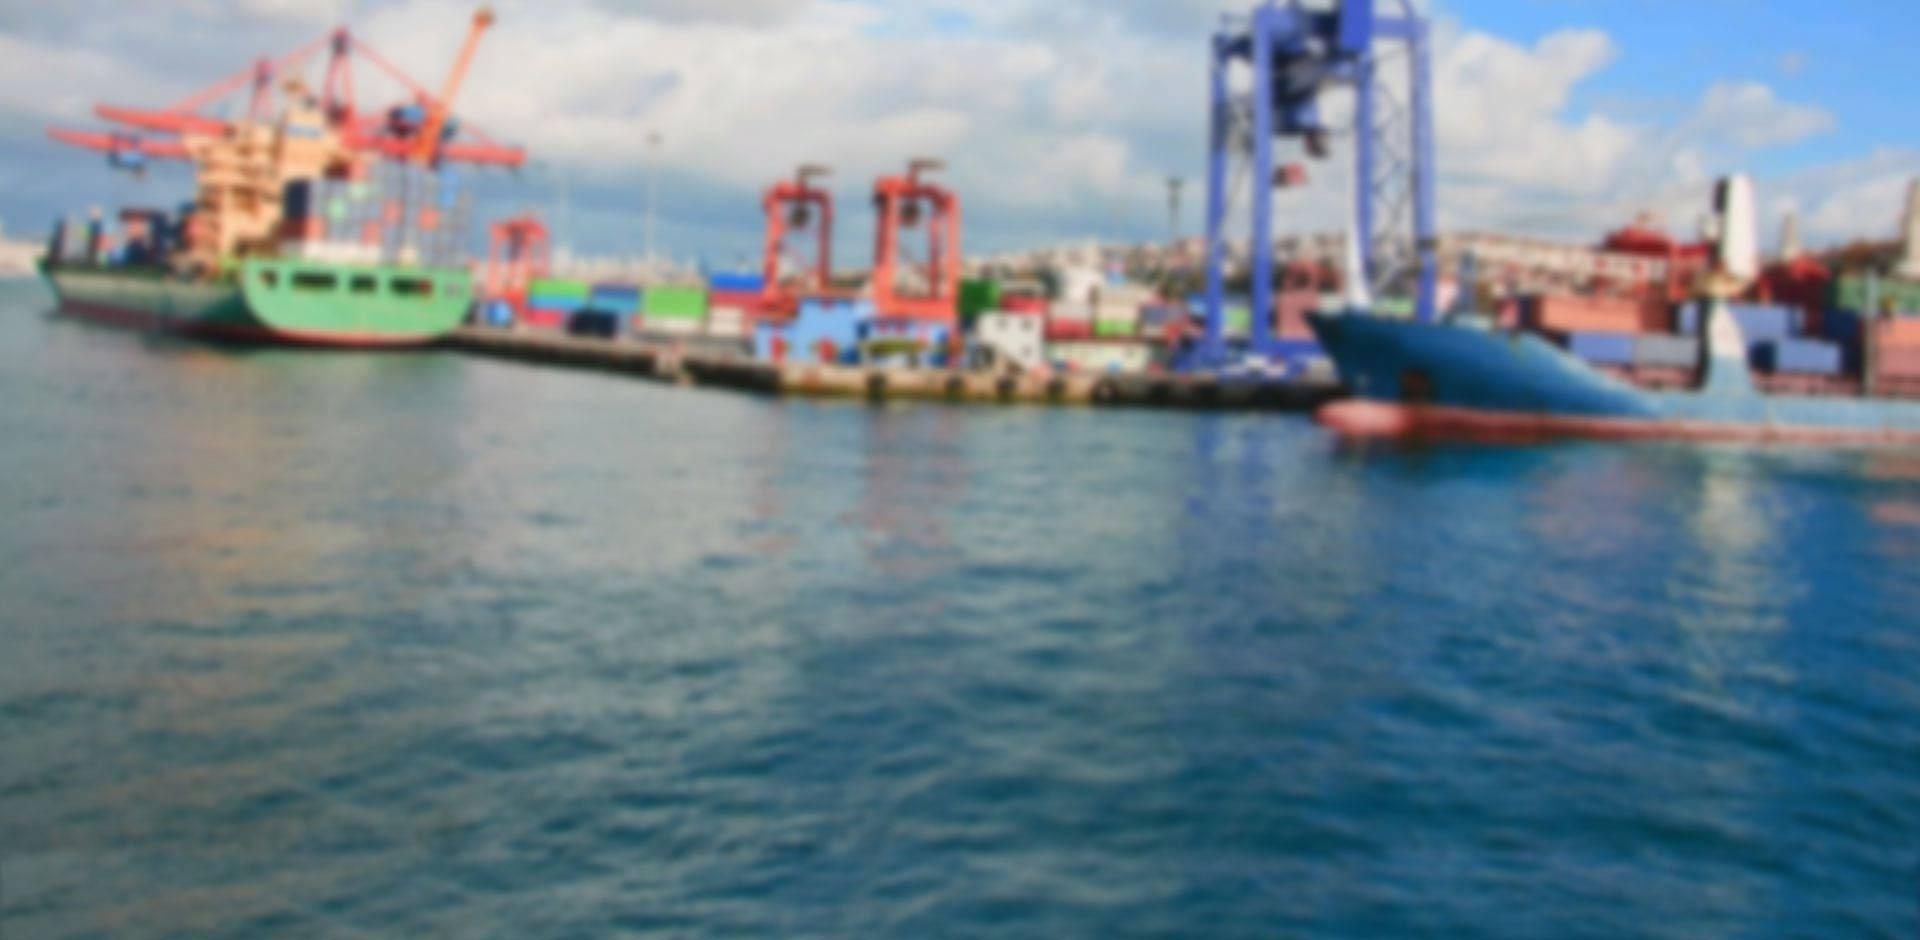 emploi maritime et naval   clicandsea